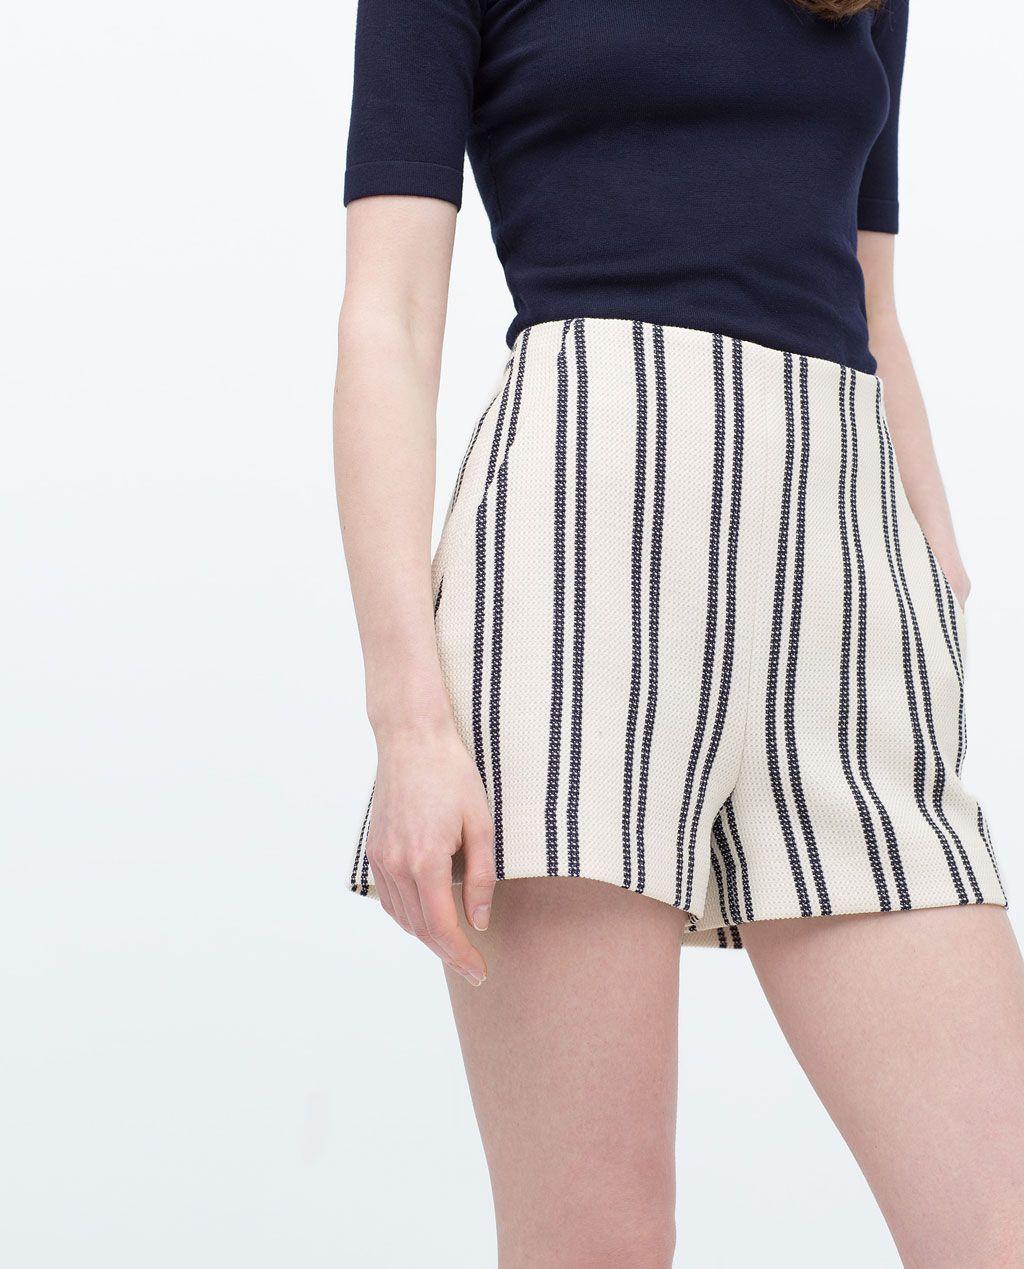 en venta 91320 59e29 HIGH-WAISTED STRIPED SHORTS-Shorts-WOMAN | ZARA United ...